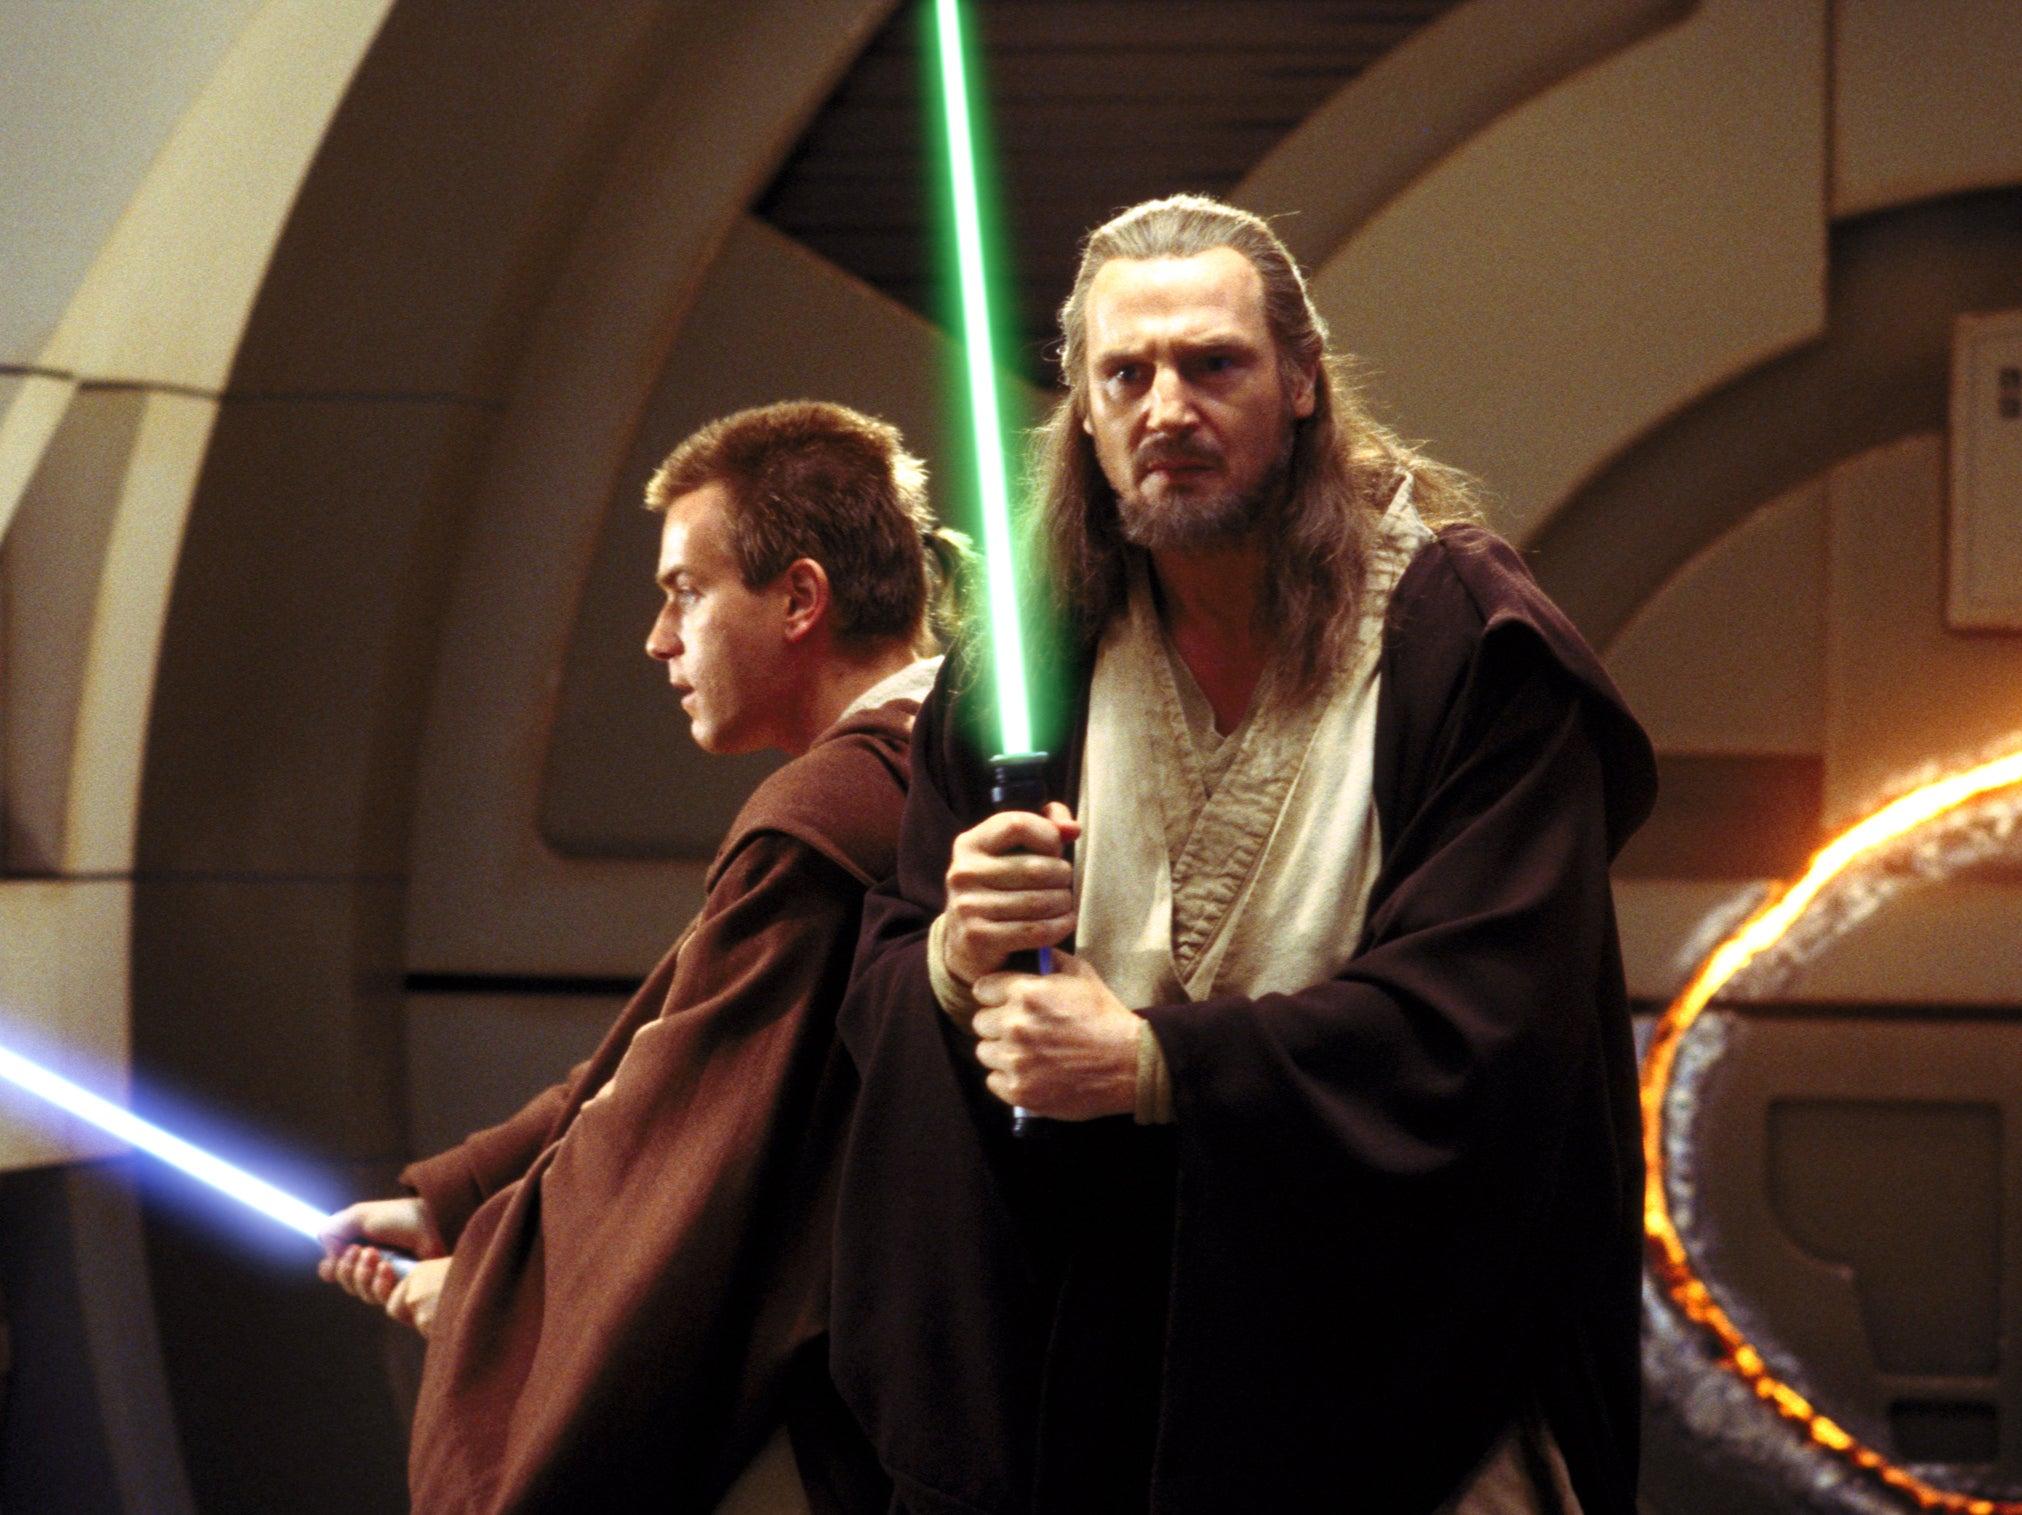 Liam Neeson says he's 'up for' return to Star Wars in Obi-Wan Kenobi series